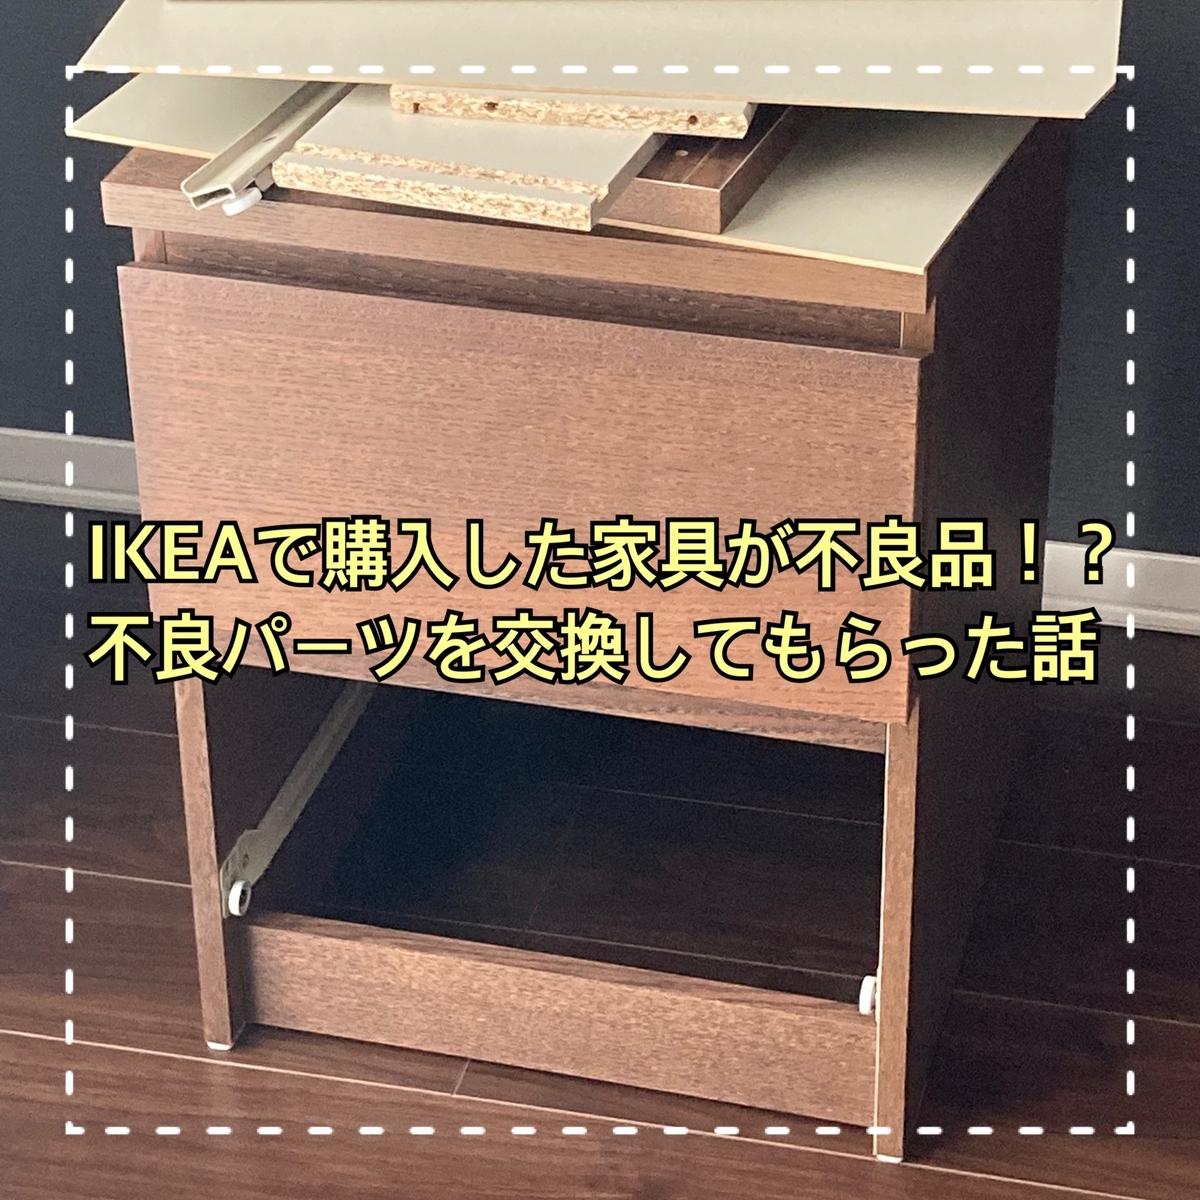 f:id:kinako_0128:20210825224634j:plain